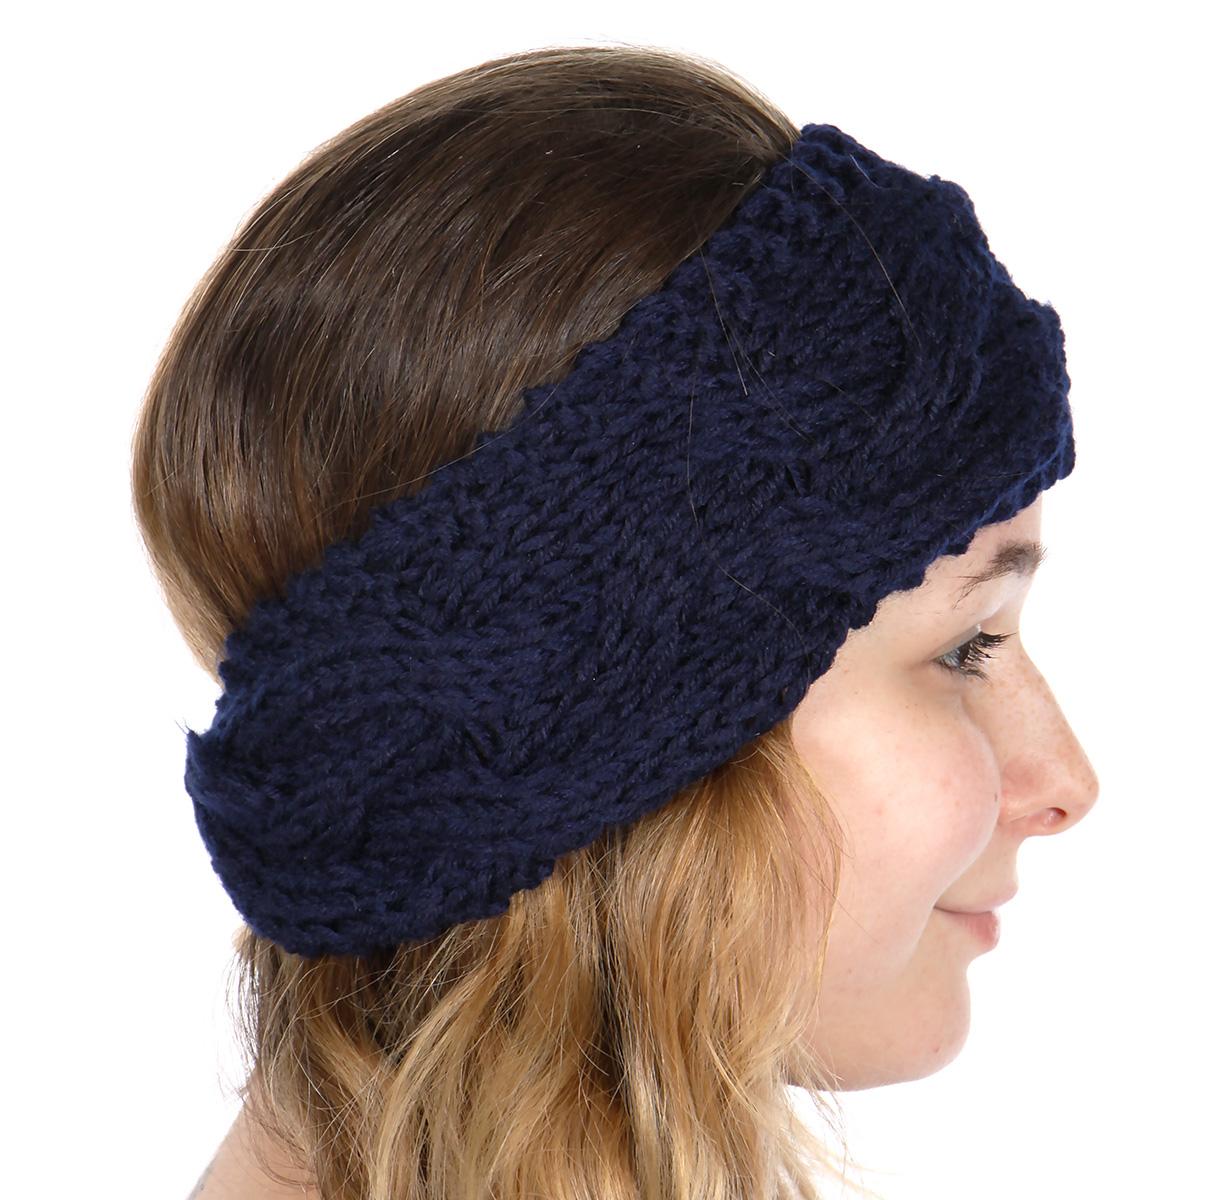 wholesale U56D Cable knit winter HEADBAND Navy